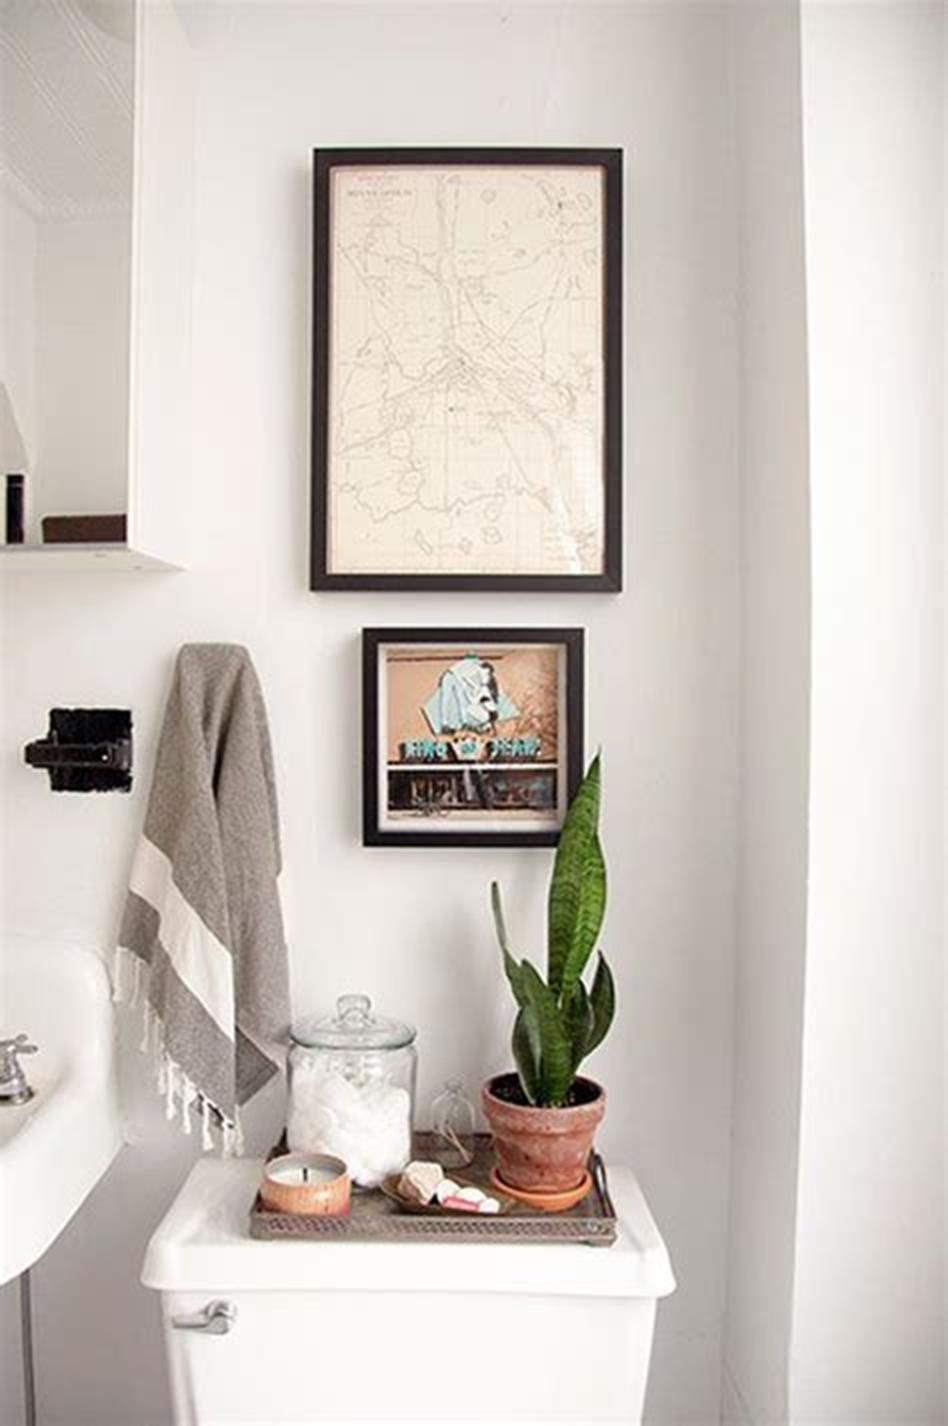 40 Beautiful Bathroom Vanity Tray Decor Ideas Decorecent Beautiful Bathroom Vanity Beautiful Bathrooms Decor [ 1426 x 948 Pixel ]